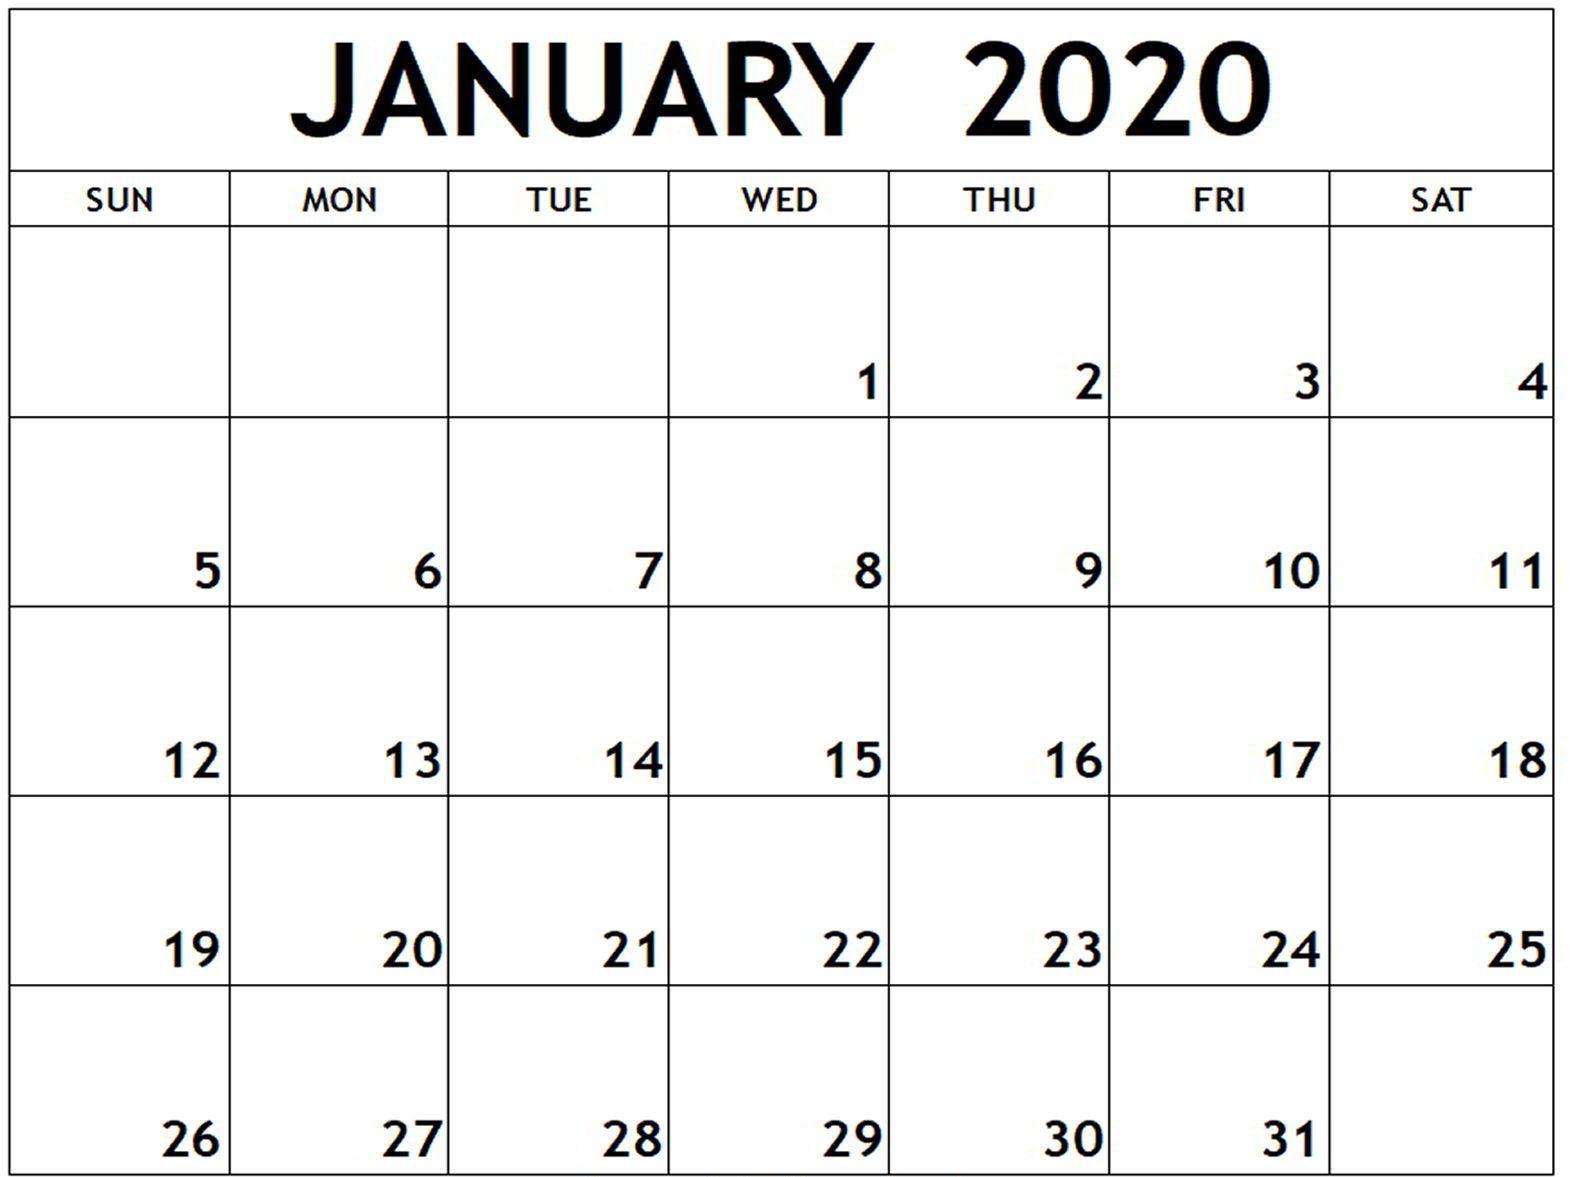 January 2020 Calendar Word Doc | Free Calendar Template